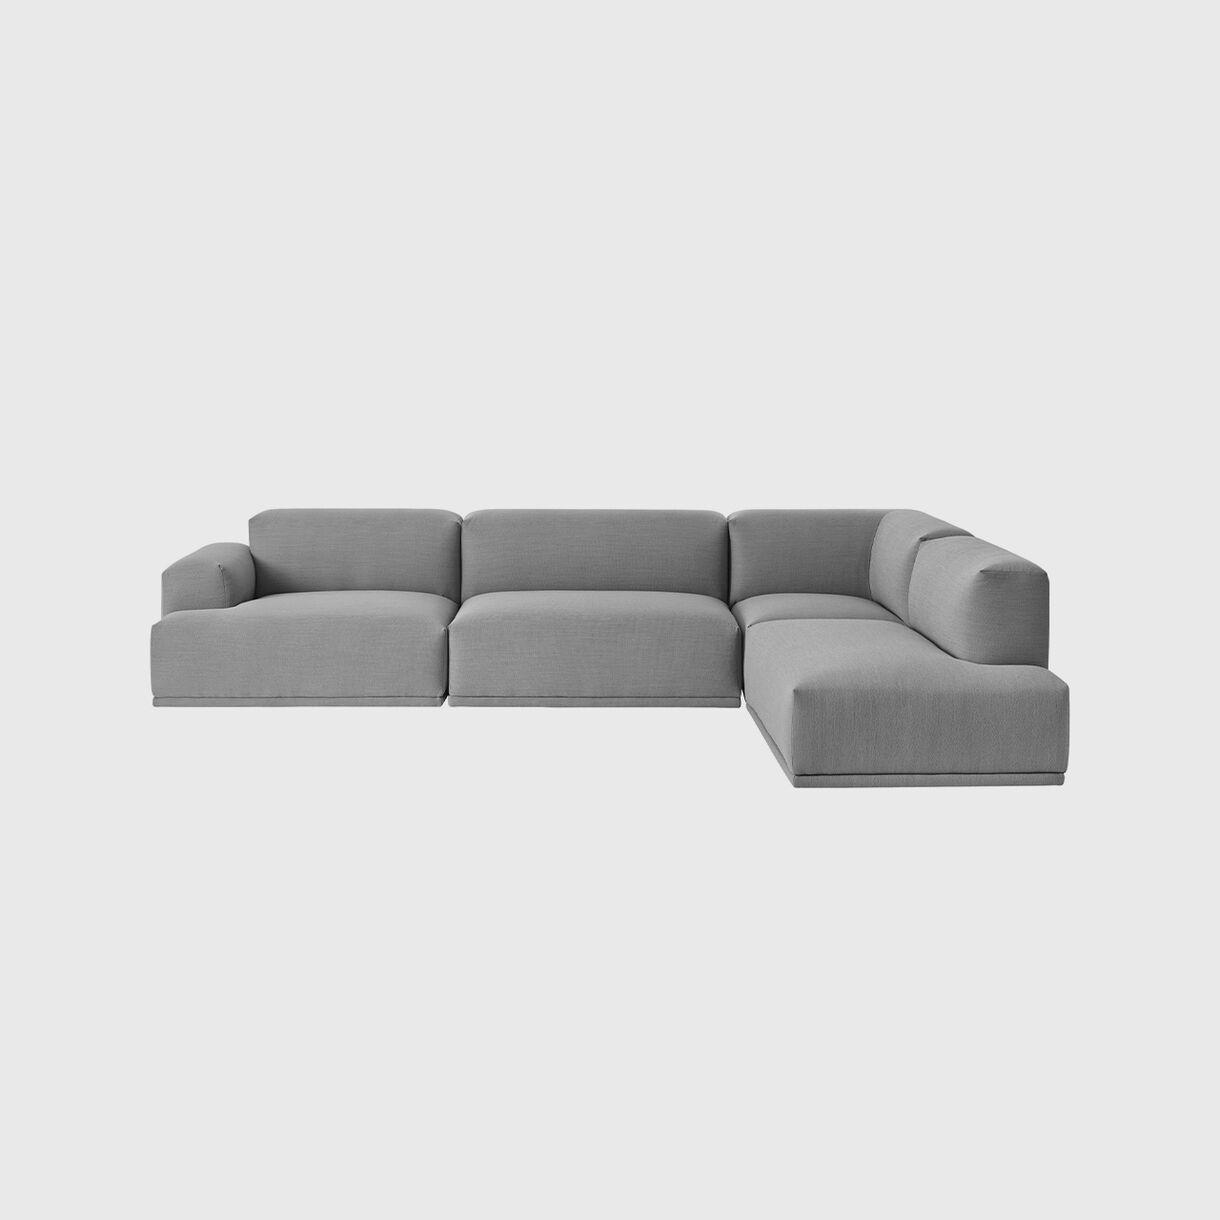 Connect Modular Corner Sofa, Steelcut Trio 133